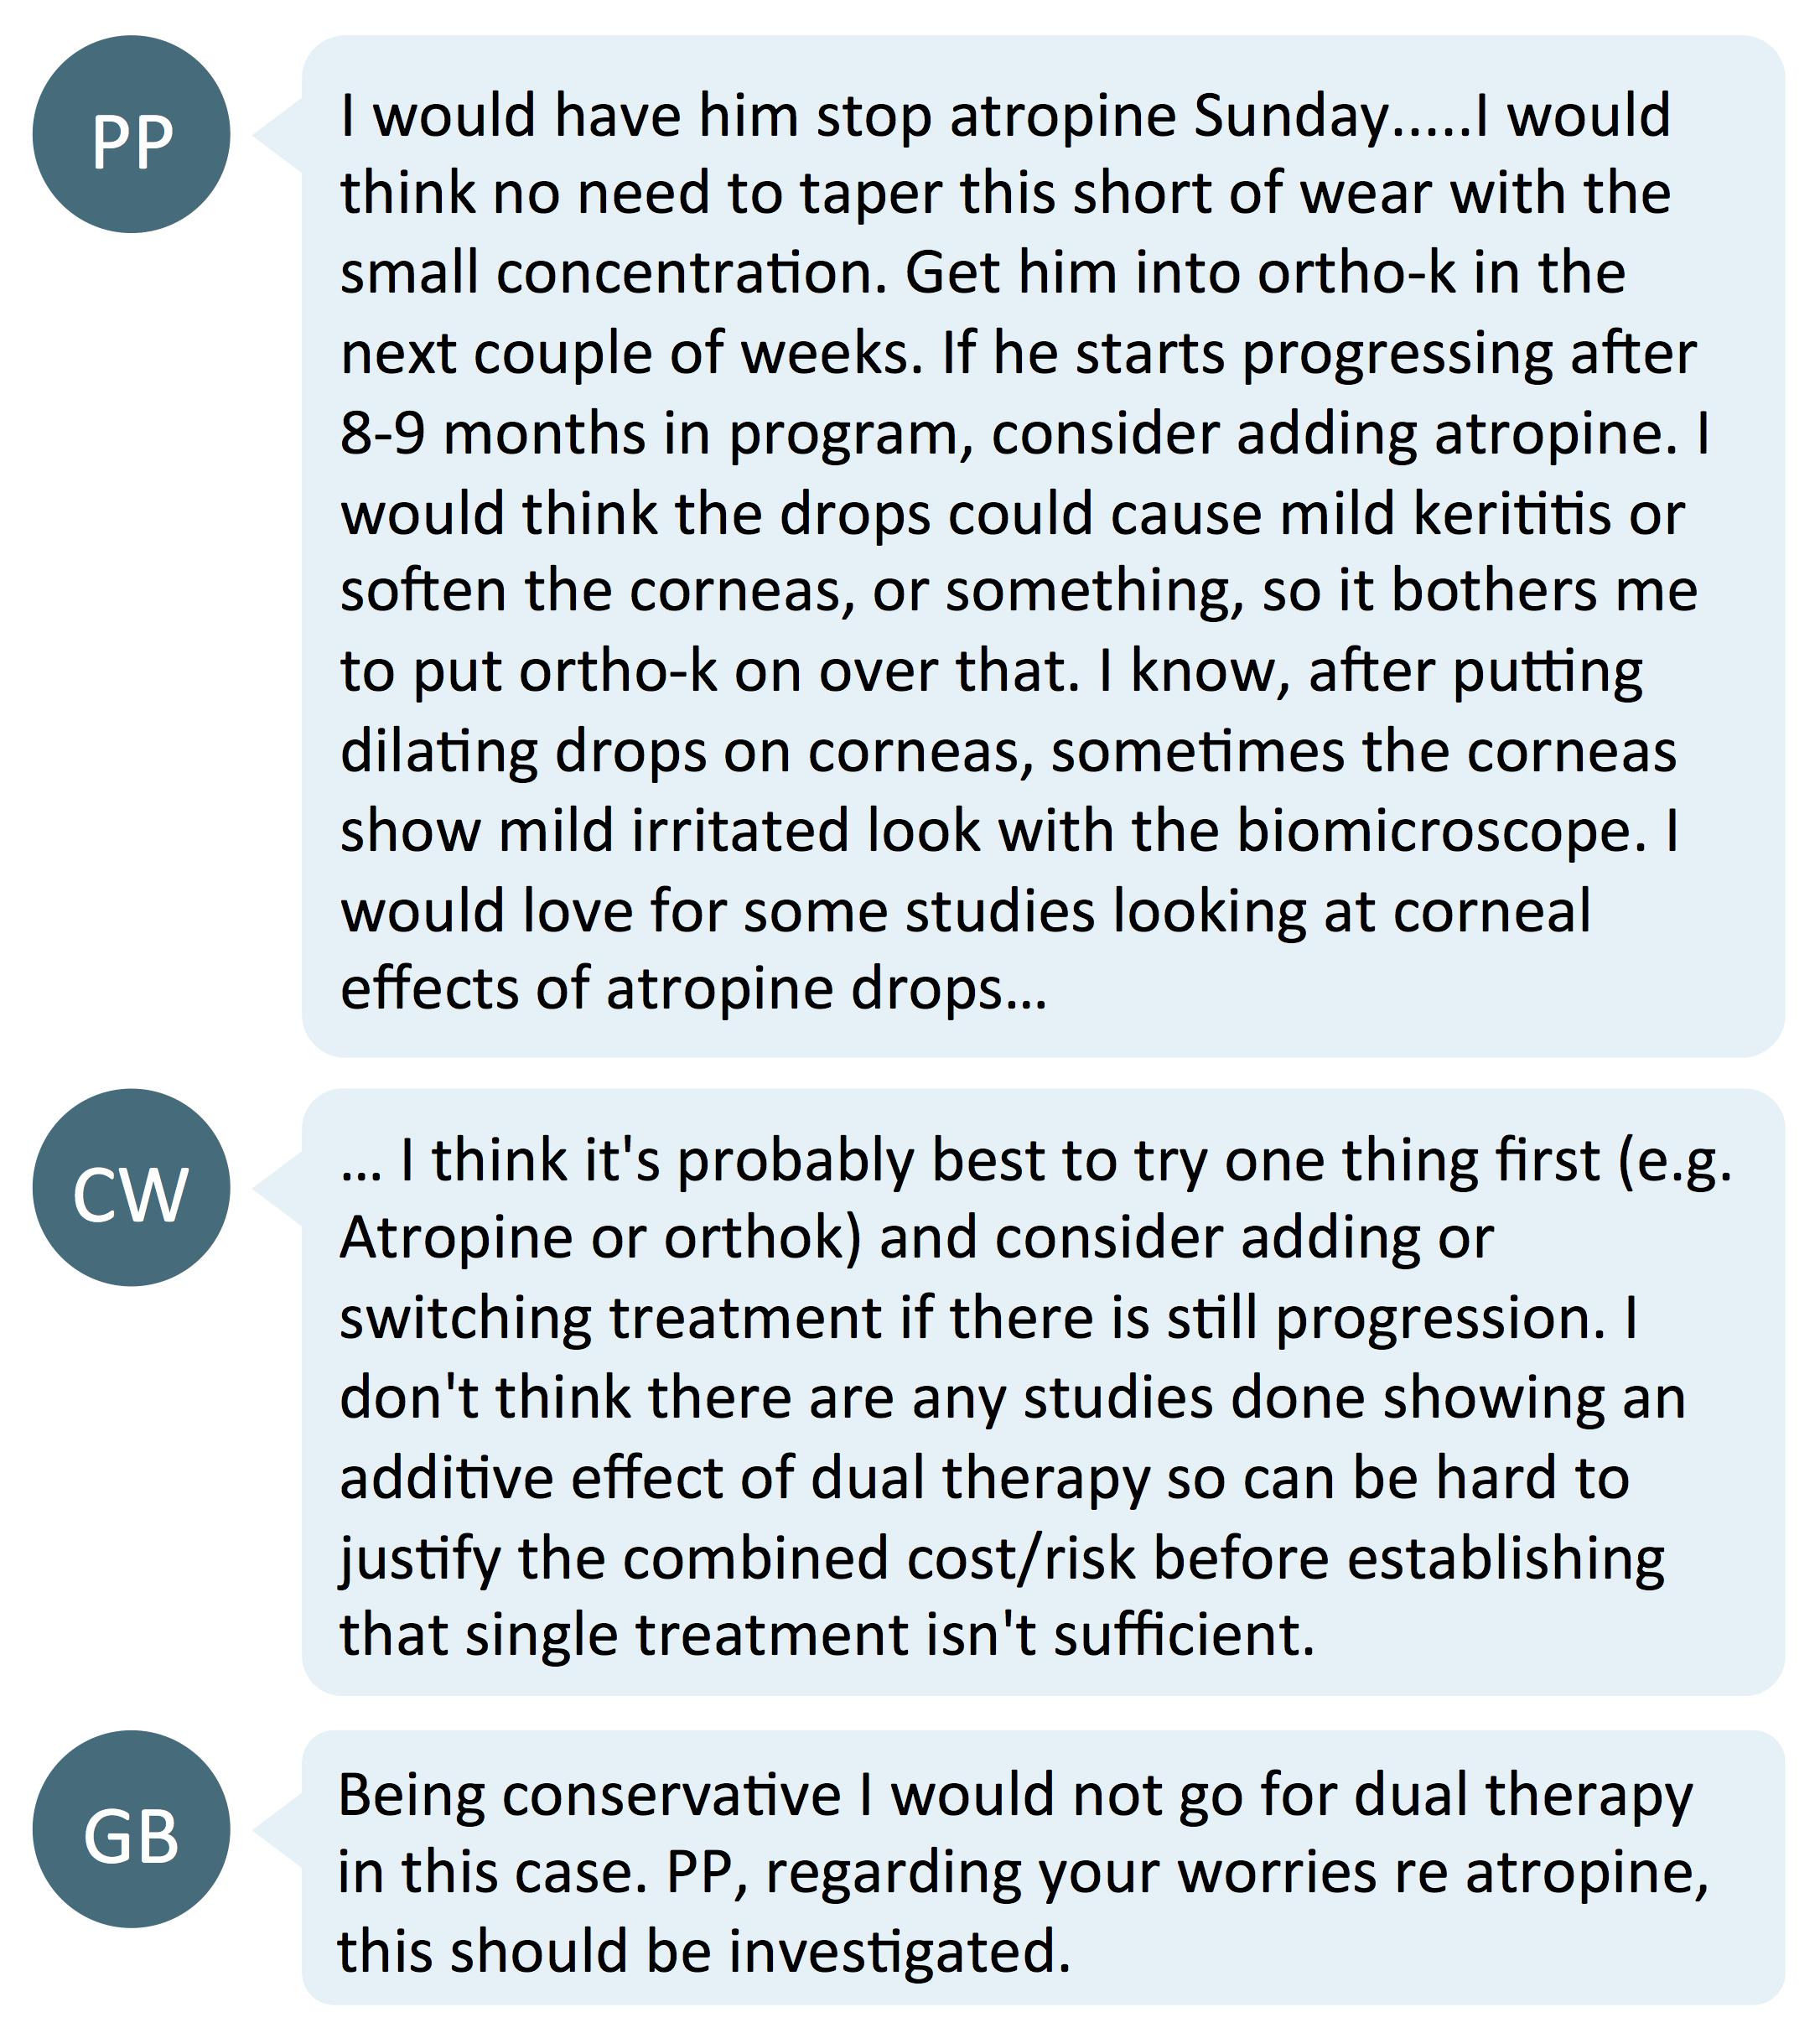 new 2nd combo treatment 2